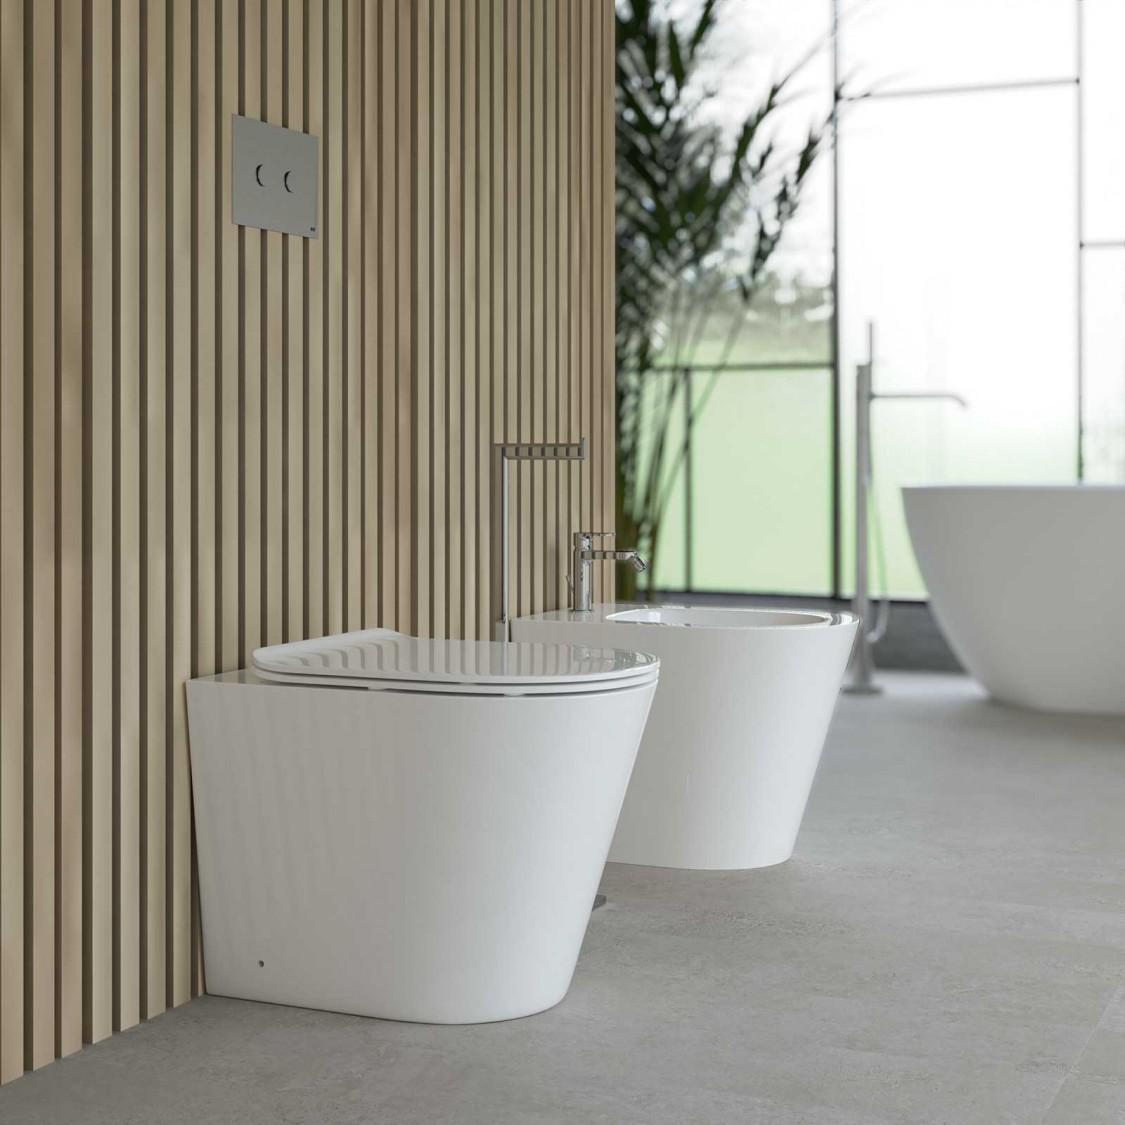 Coppie sanitari a terra filo muro | Shop Online Idroplus